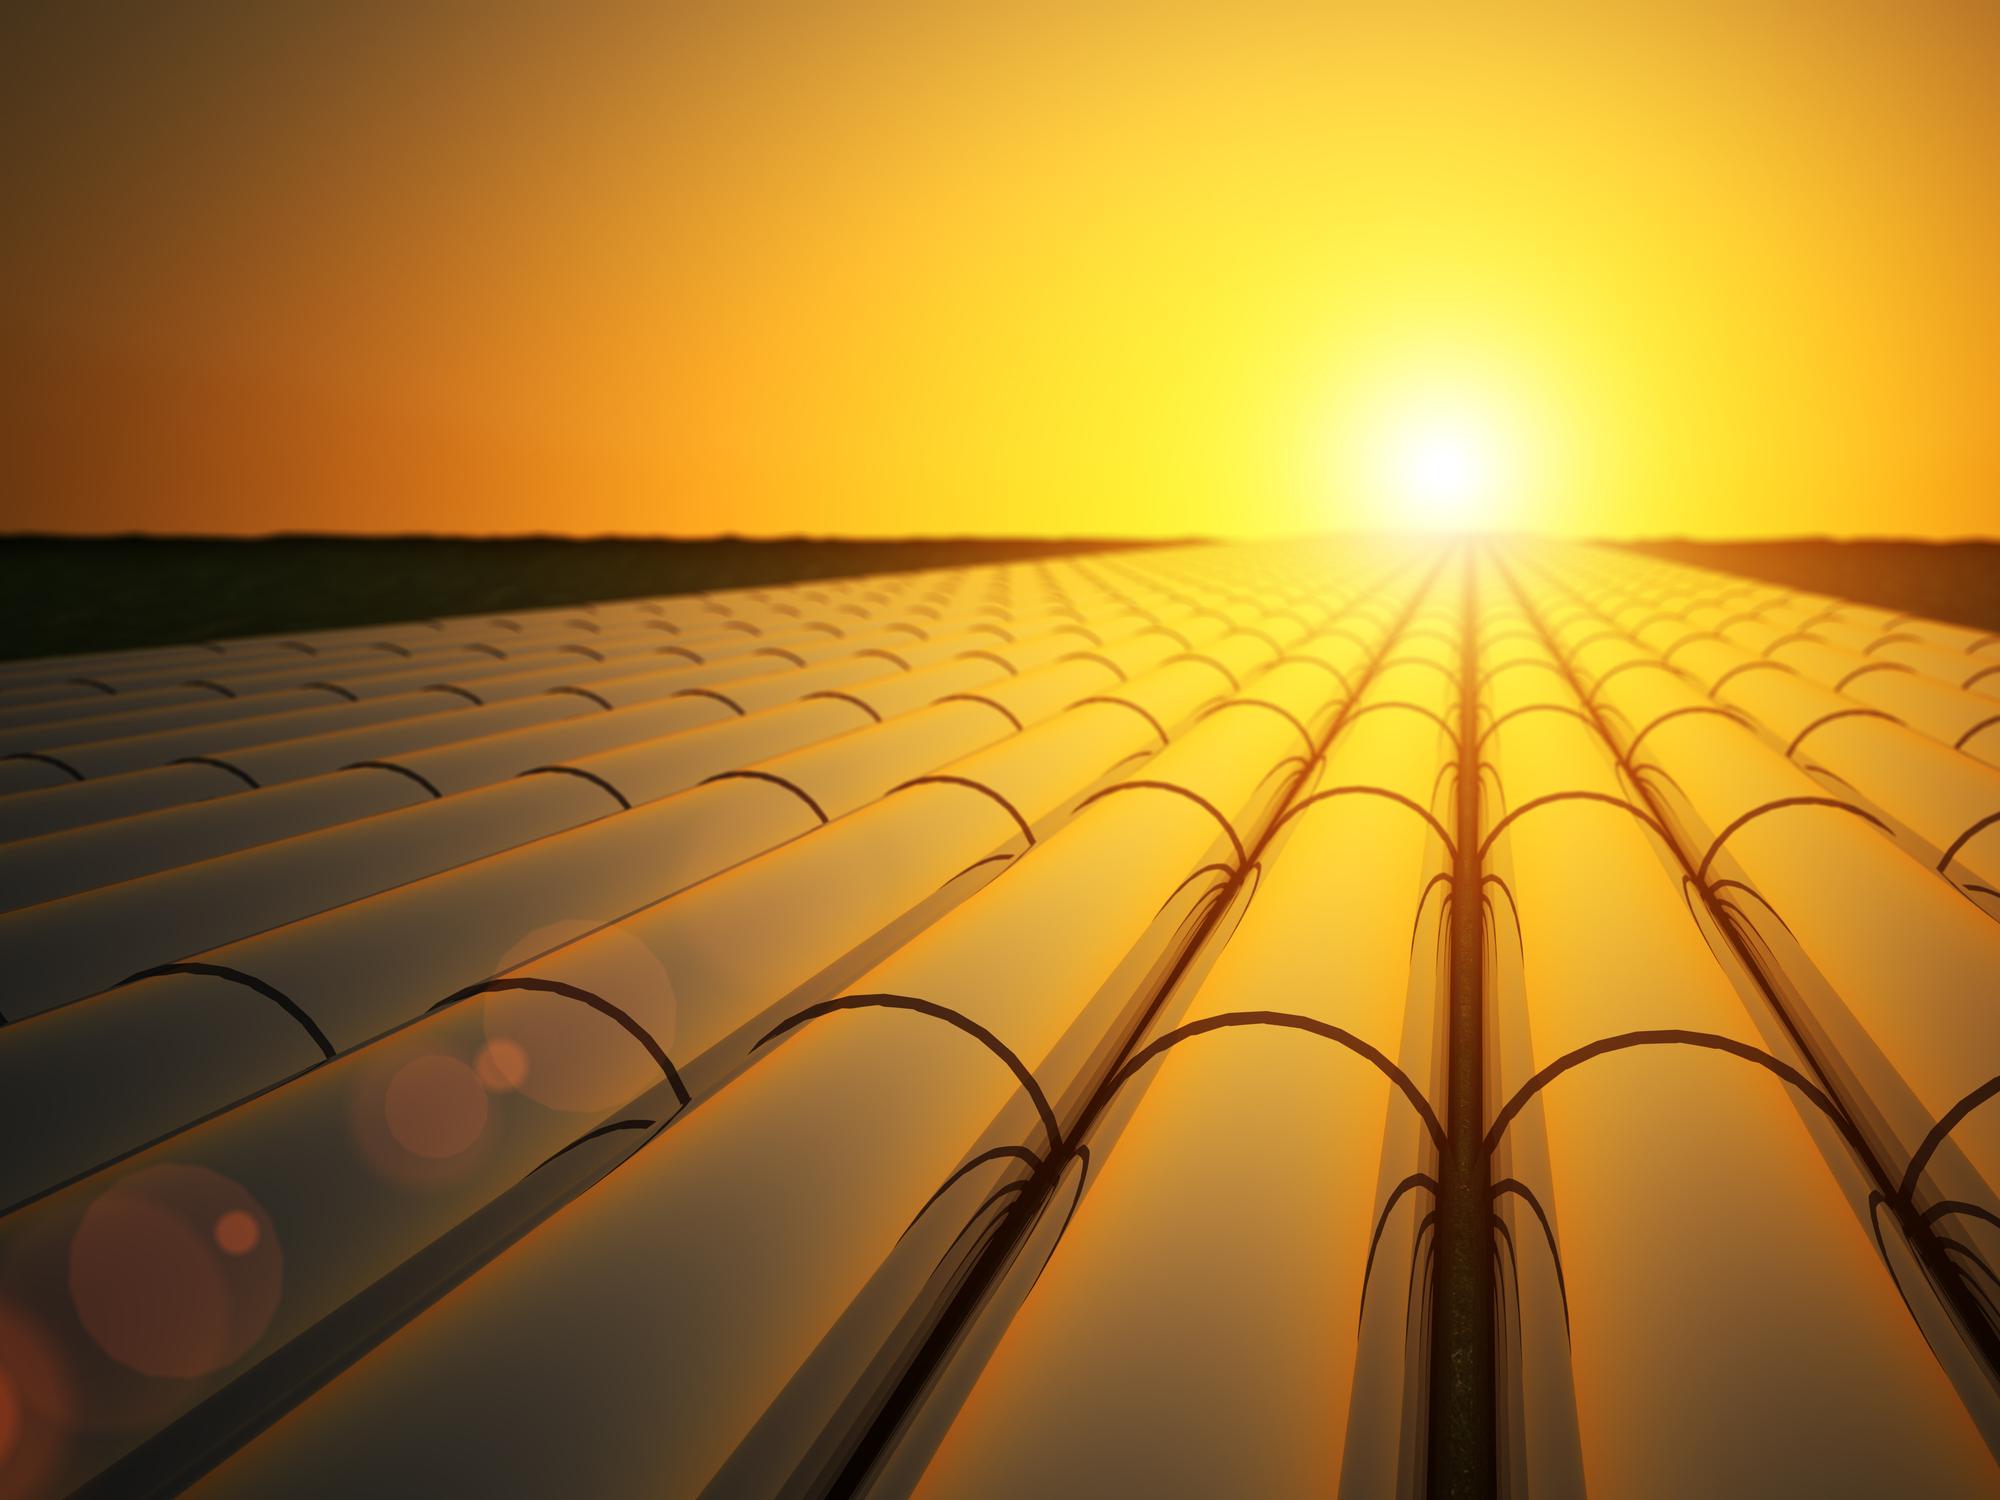 Pipelines heading towards the bright sun.